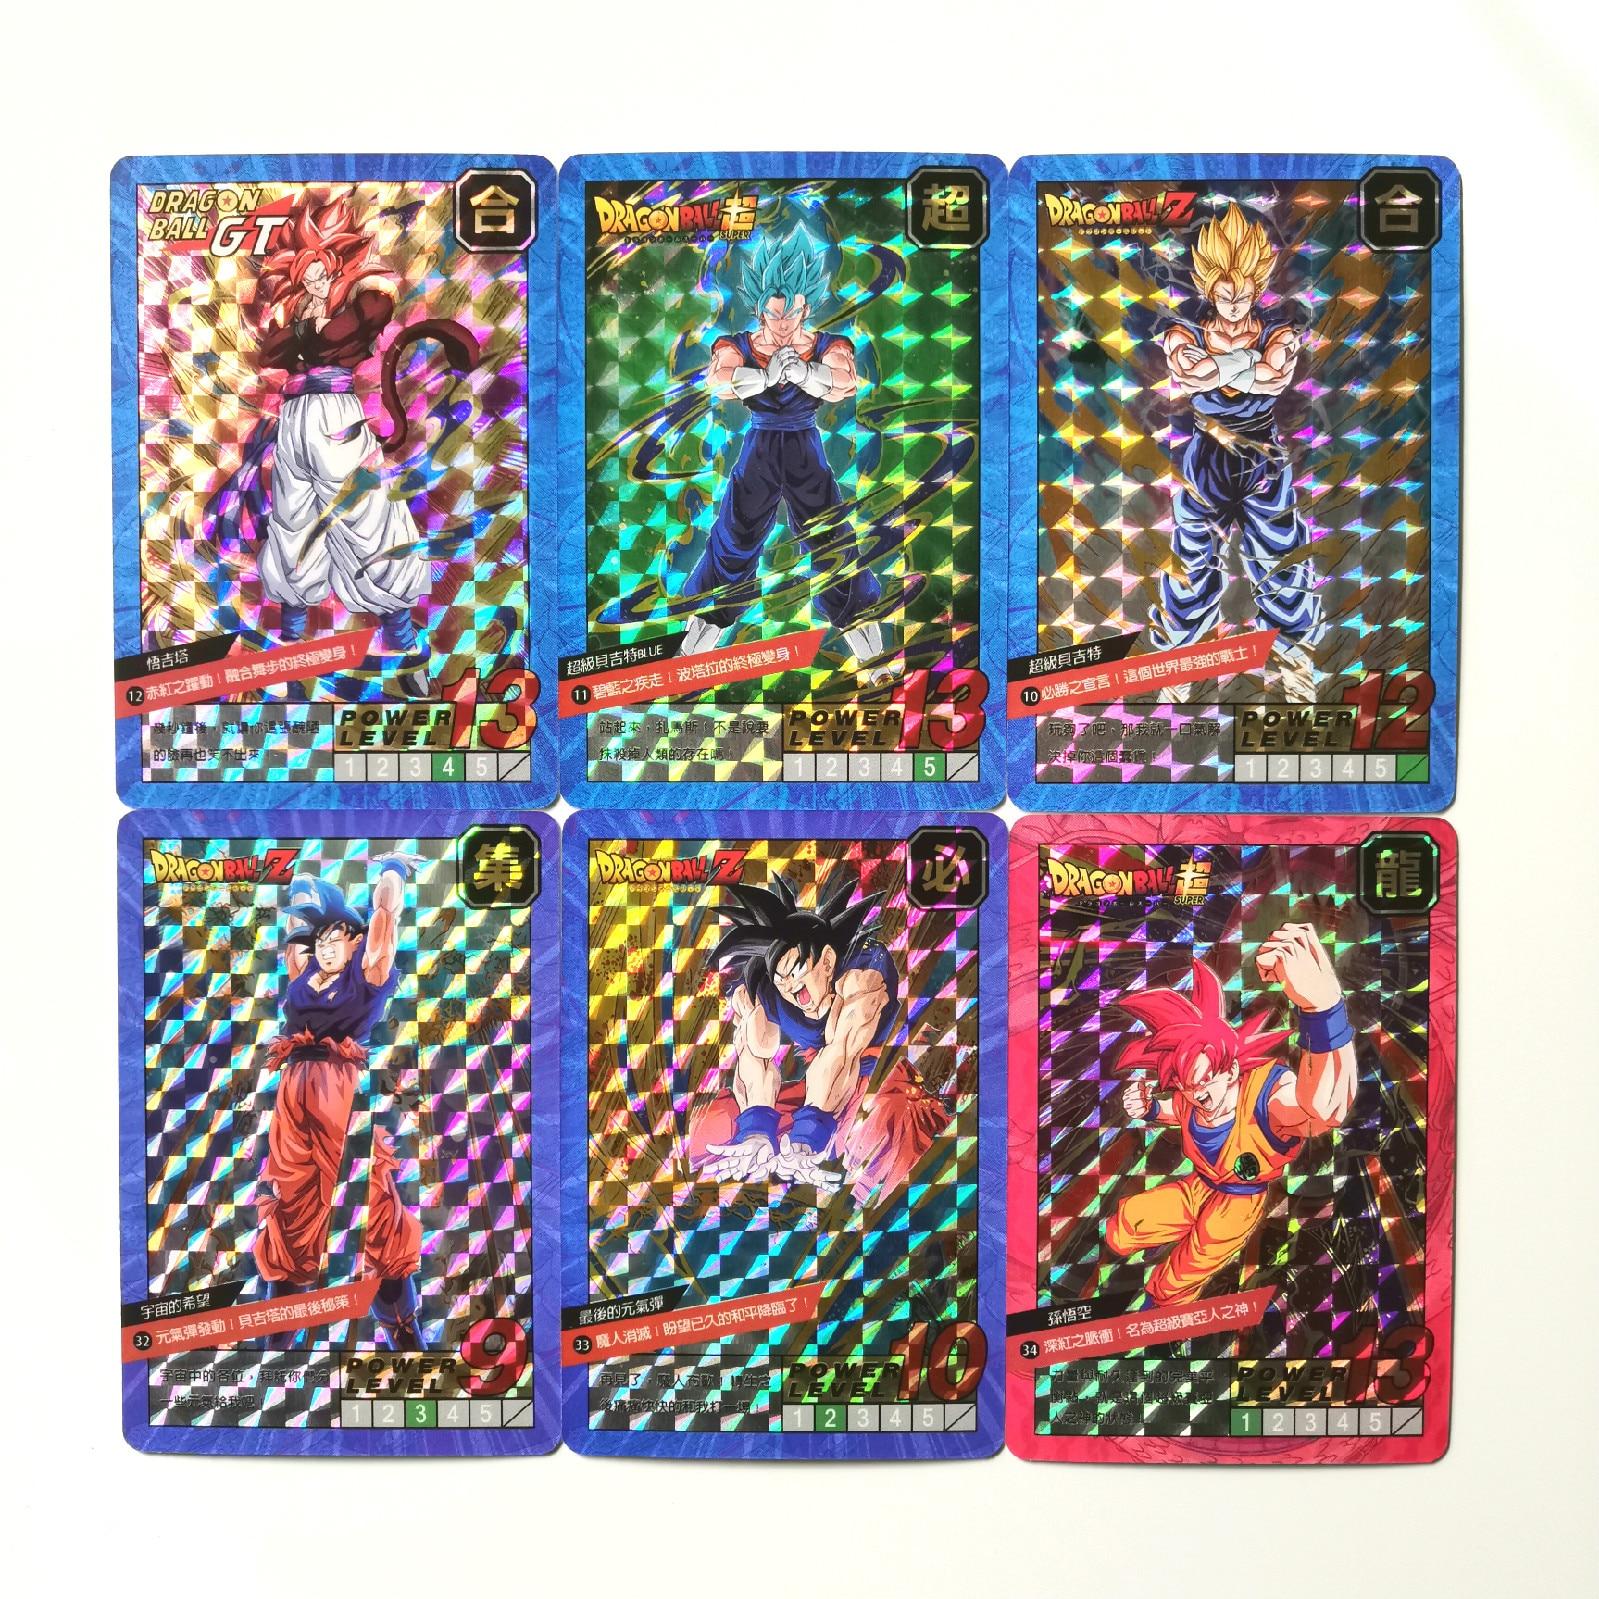 37pcs/set Super Dragon Ball Z Burst Fight Battle Card Ultra Instinct Goku Vegeta Dragon Ball Super Game Collection Cards